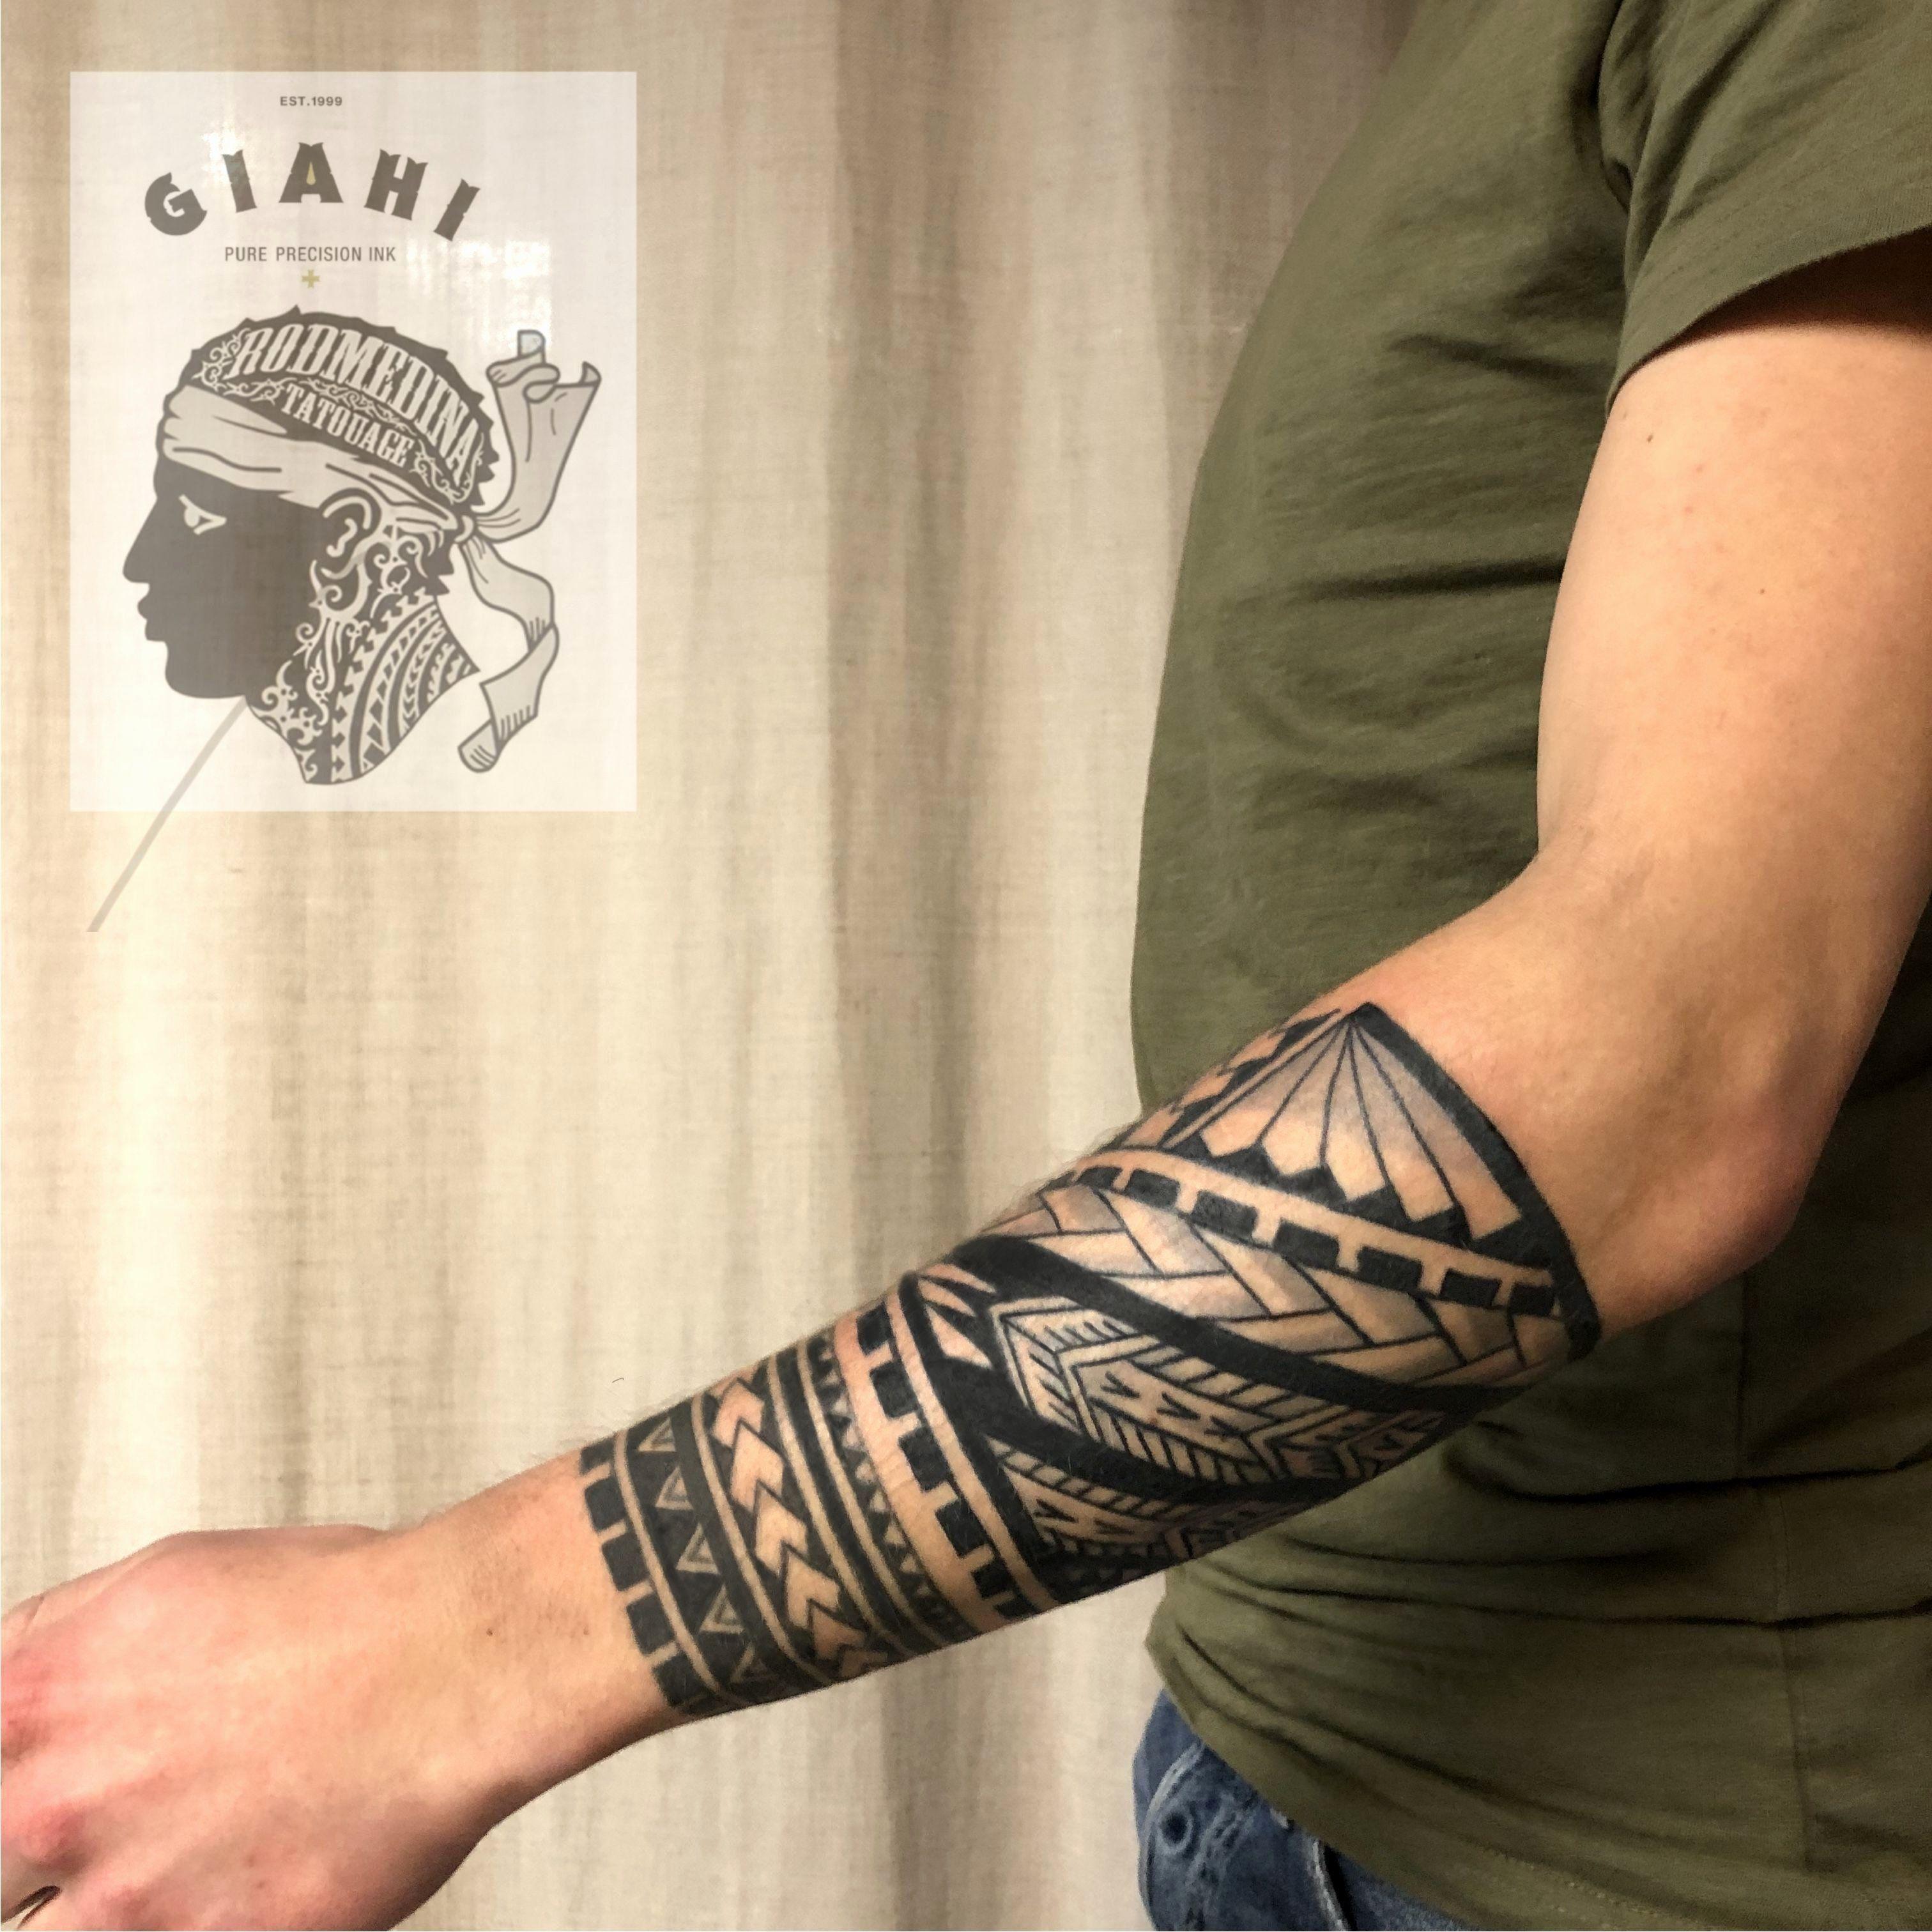 Design Your Sleeve Tattoo New Maori Tattoo Designs Maori Tattoo Designs Sleeve In 2020 Tribal Arm Tattoos Maori Tattoo Designs Tribal Tattoos For Men